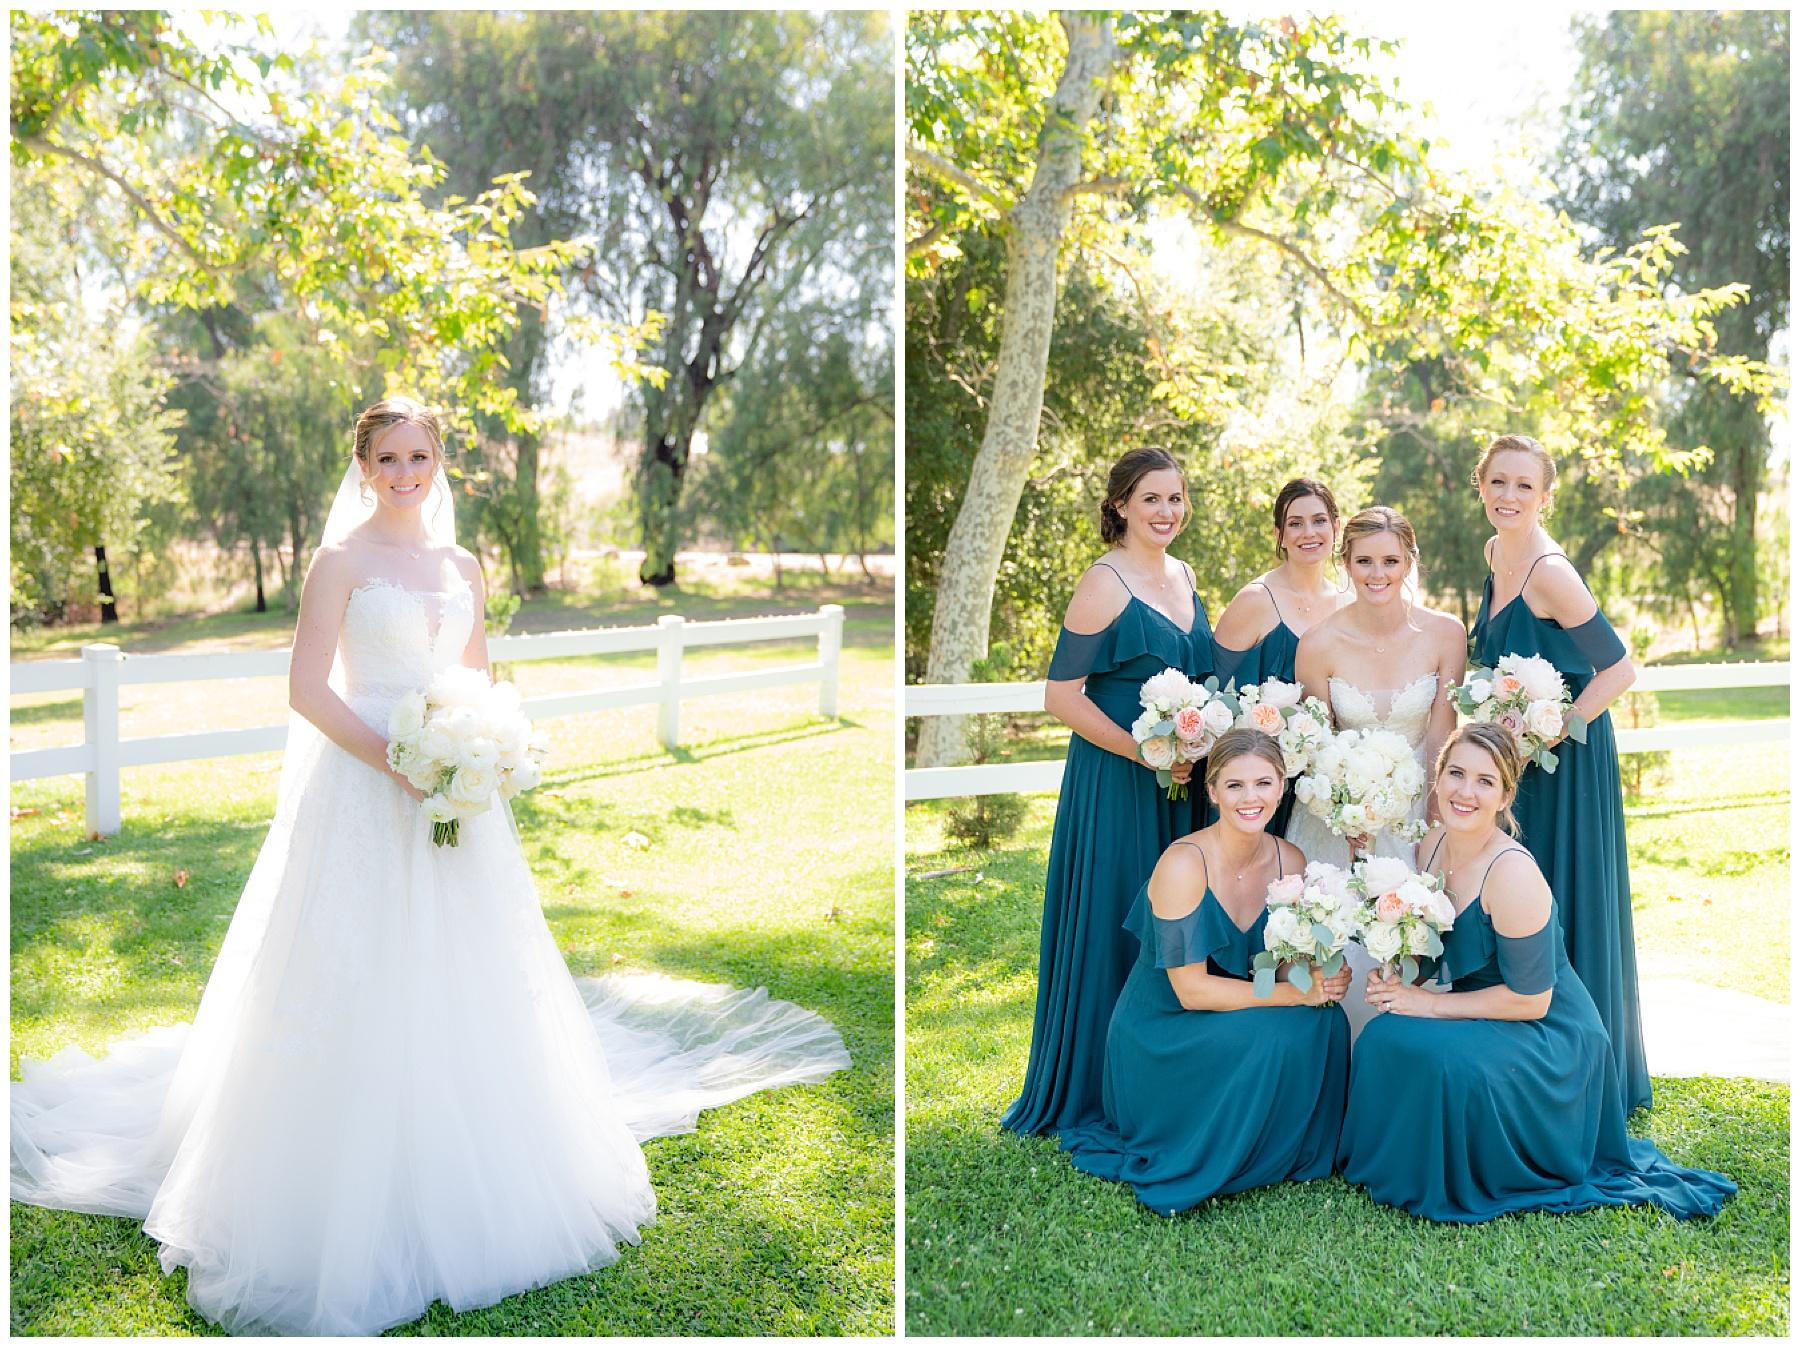 teal bridal party dress